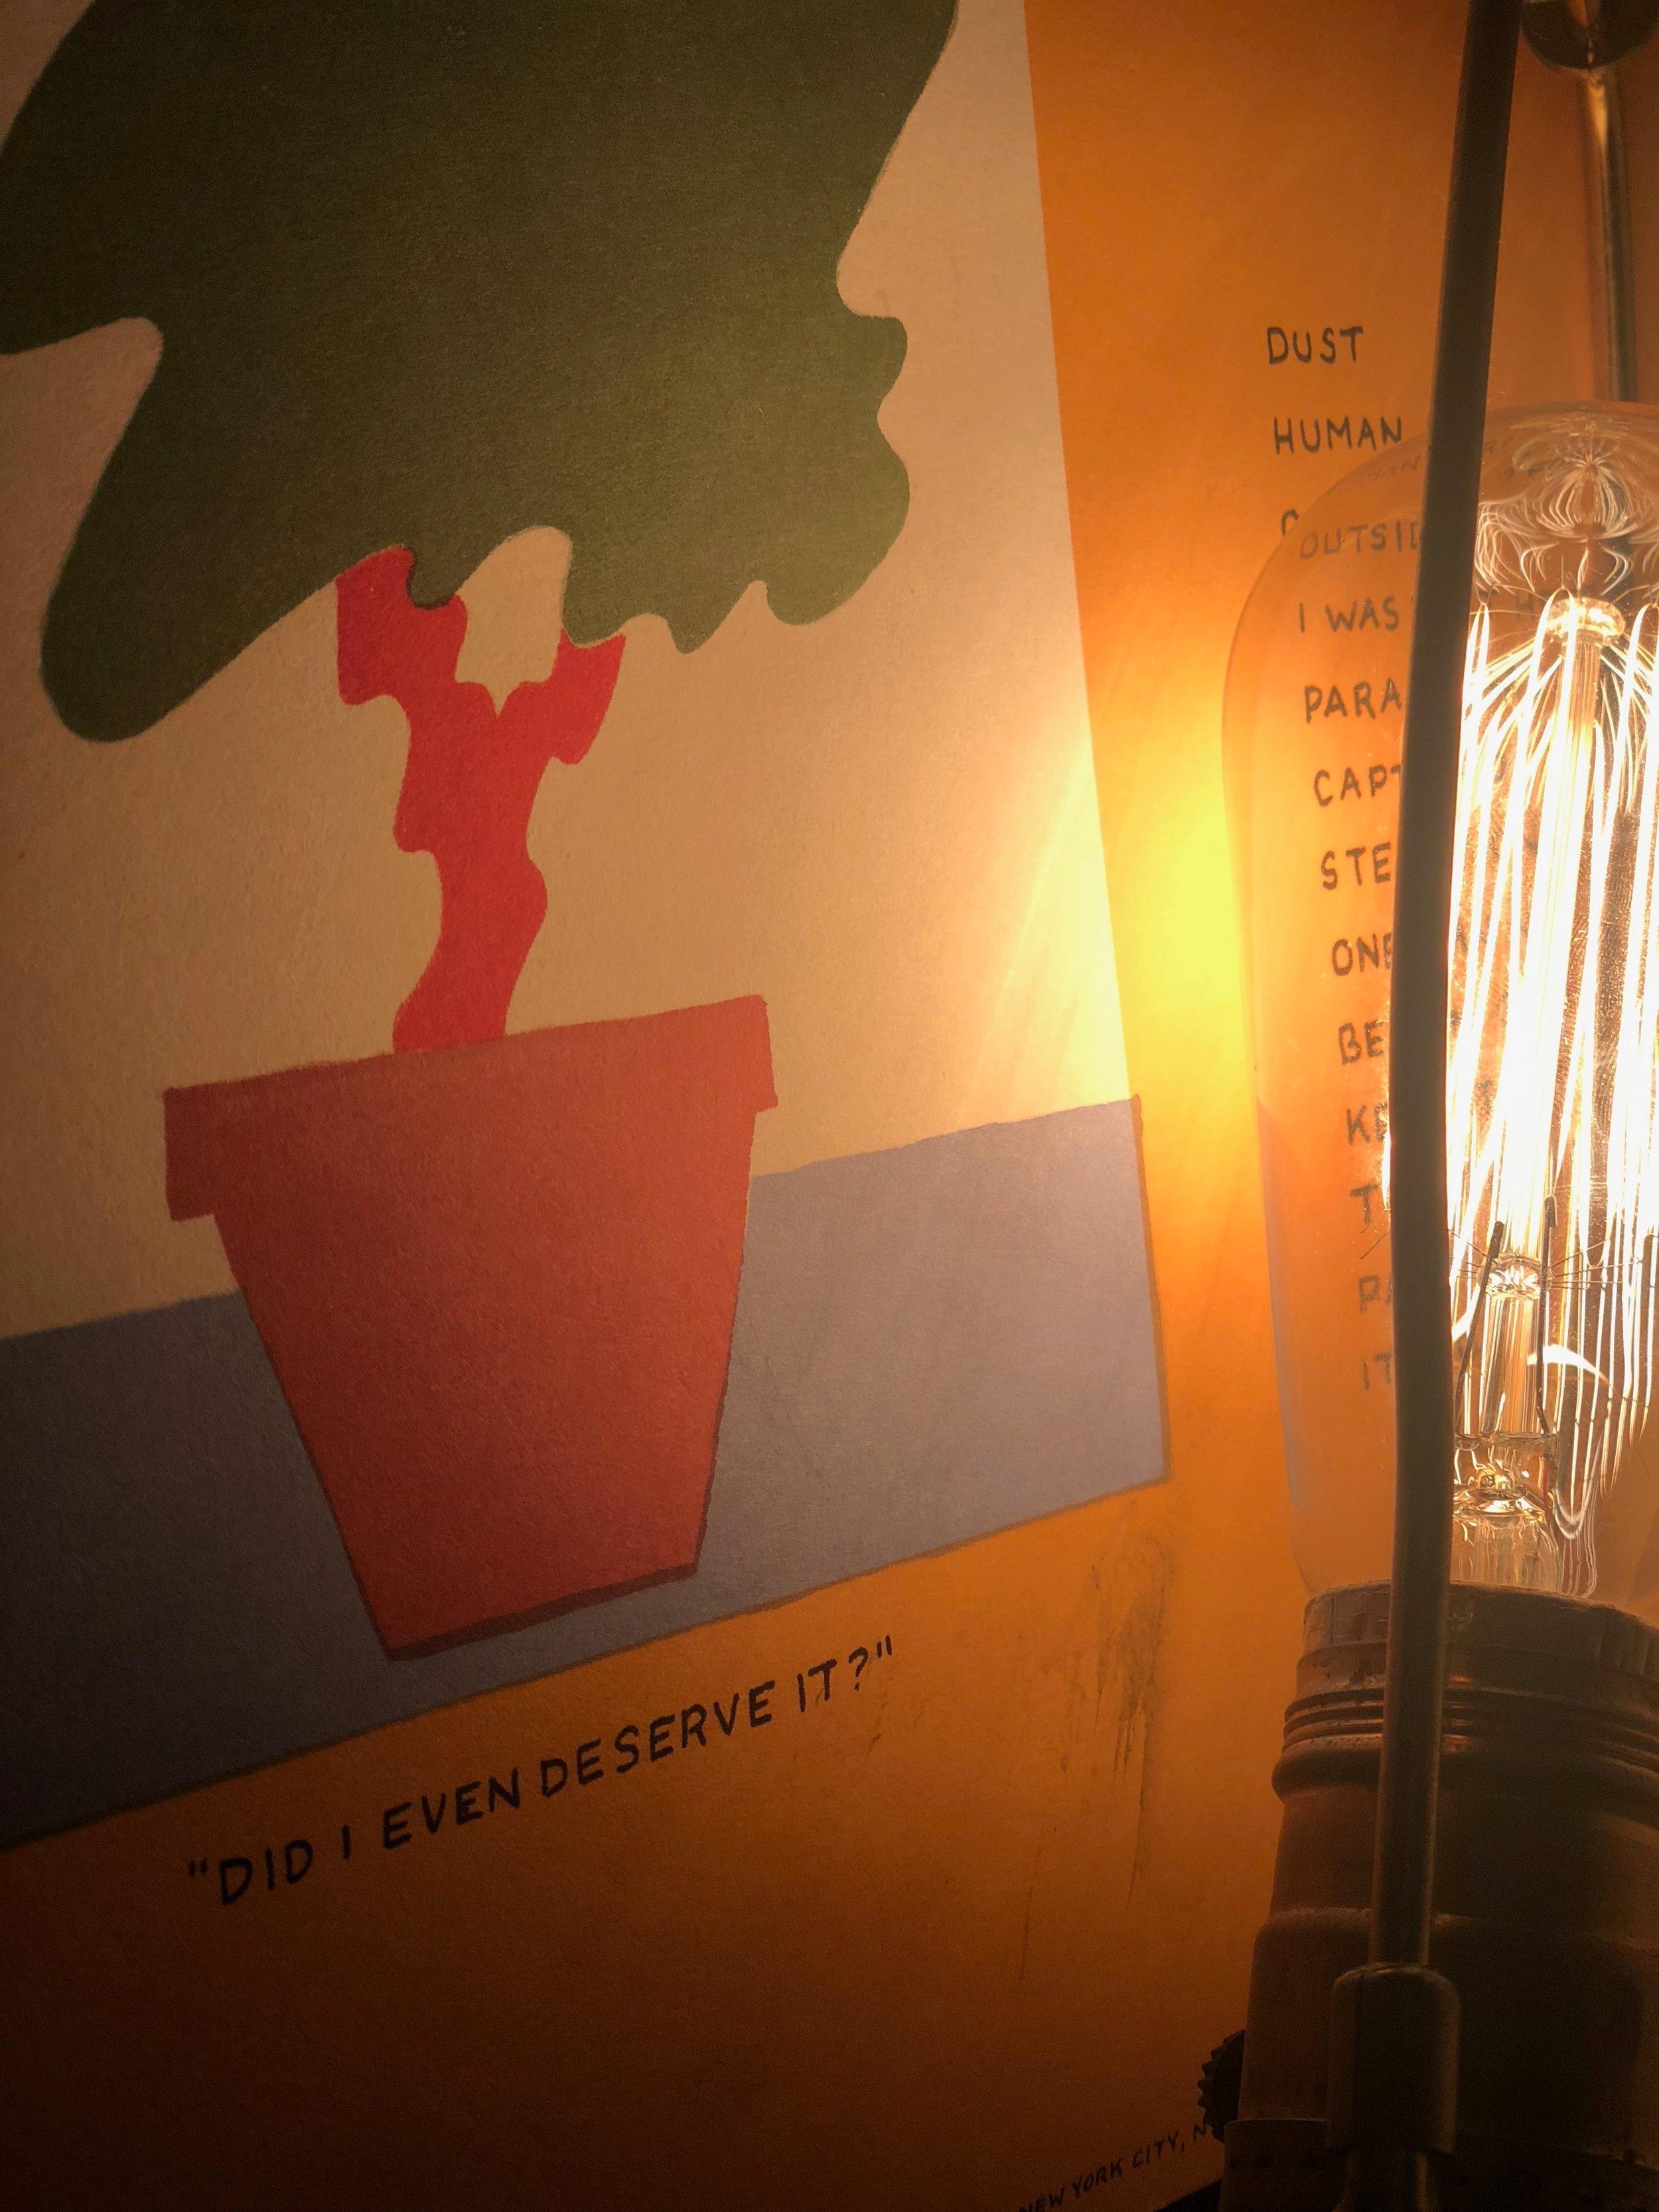 retro lightbulb illuminating books